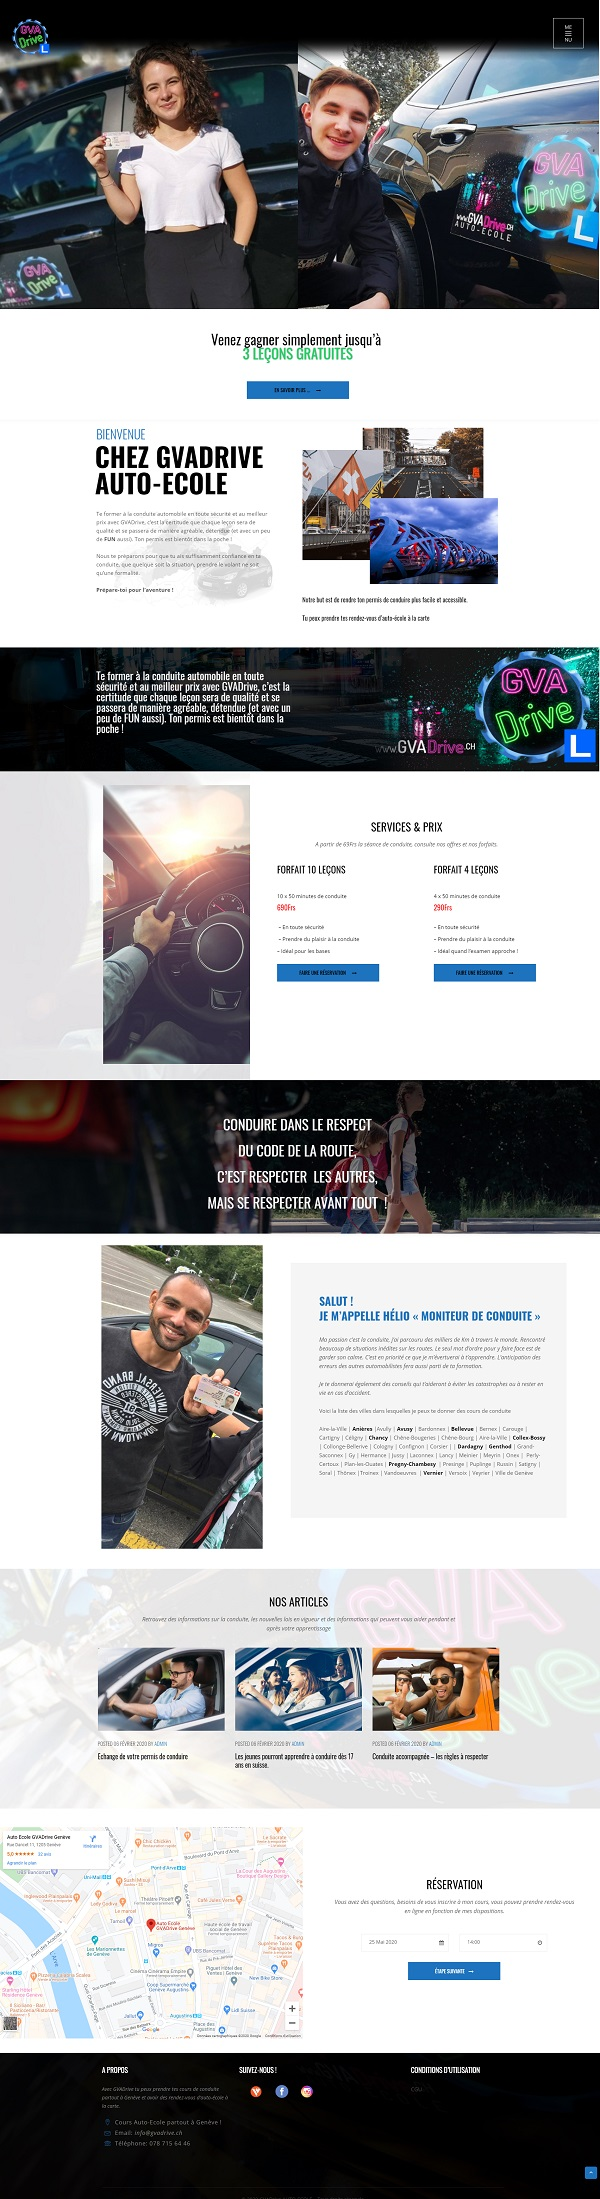 Graphitys Web Design - VIP Crossing